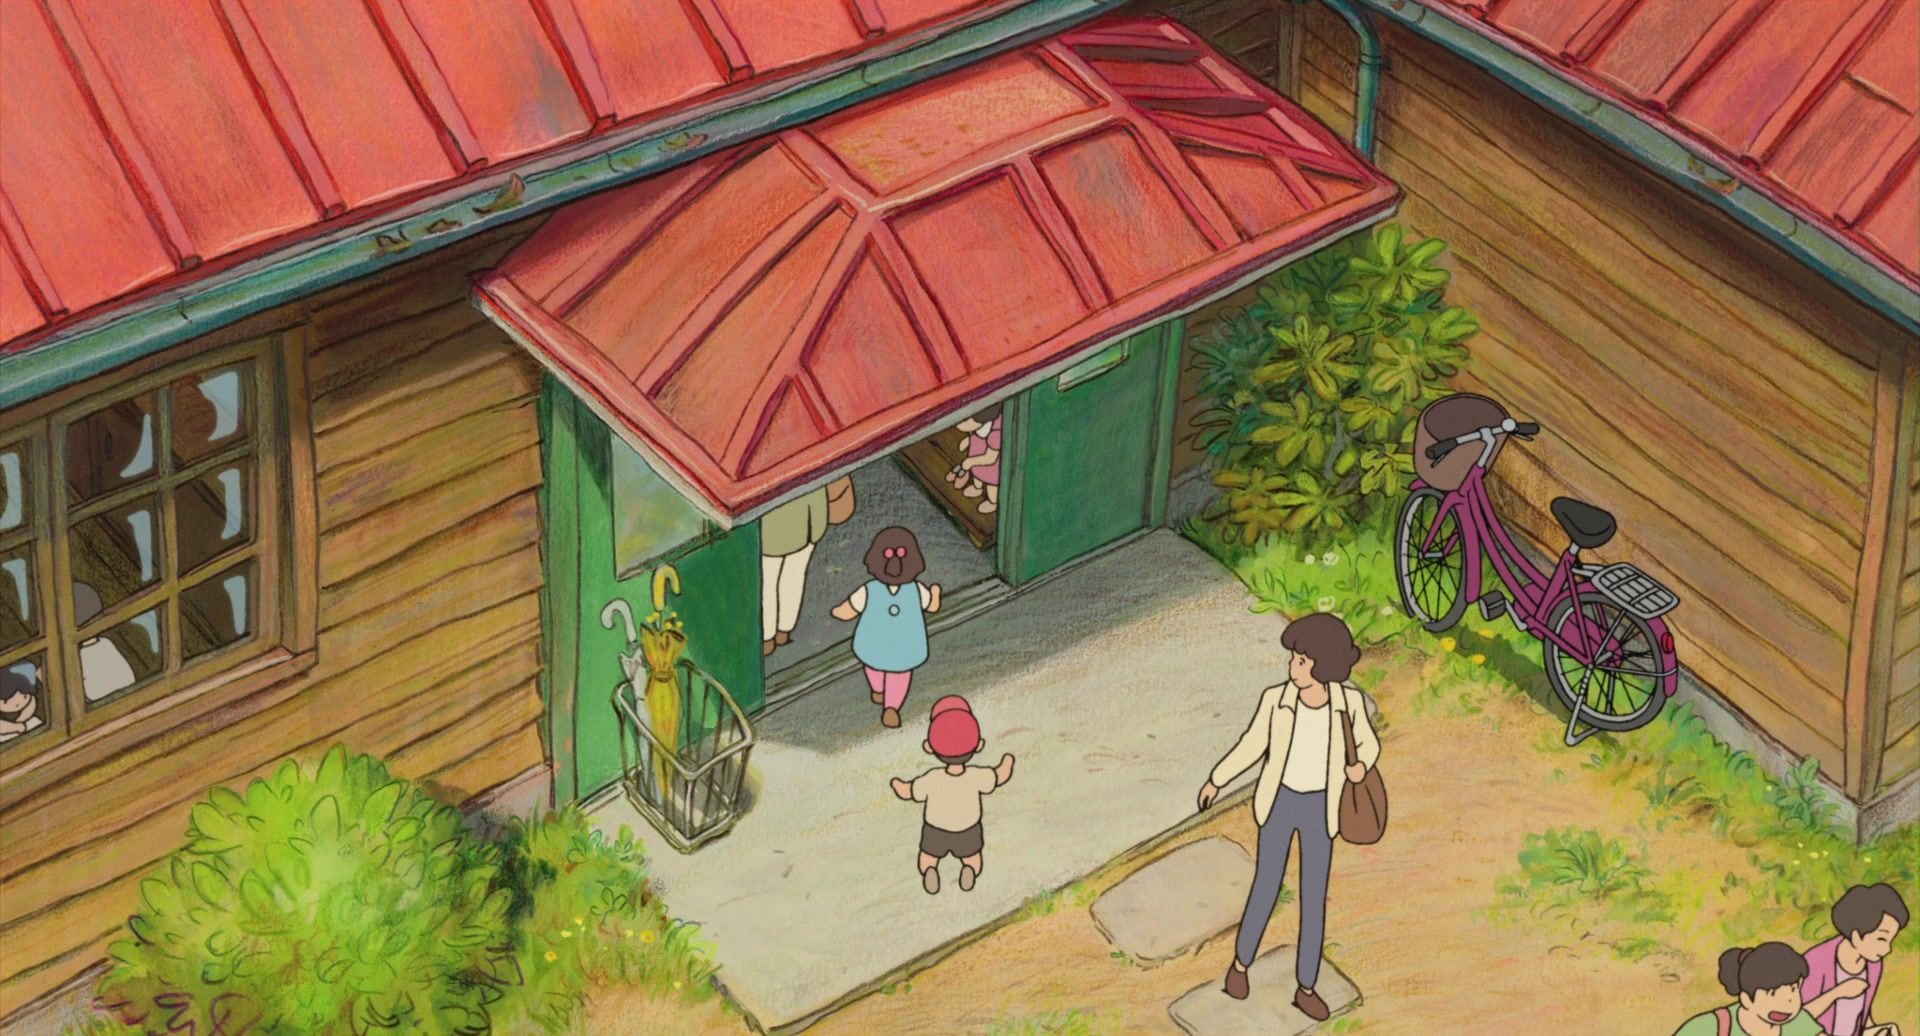 Idea by Jethro Piano on Studio Ghibli Studio ghibli